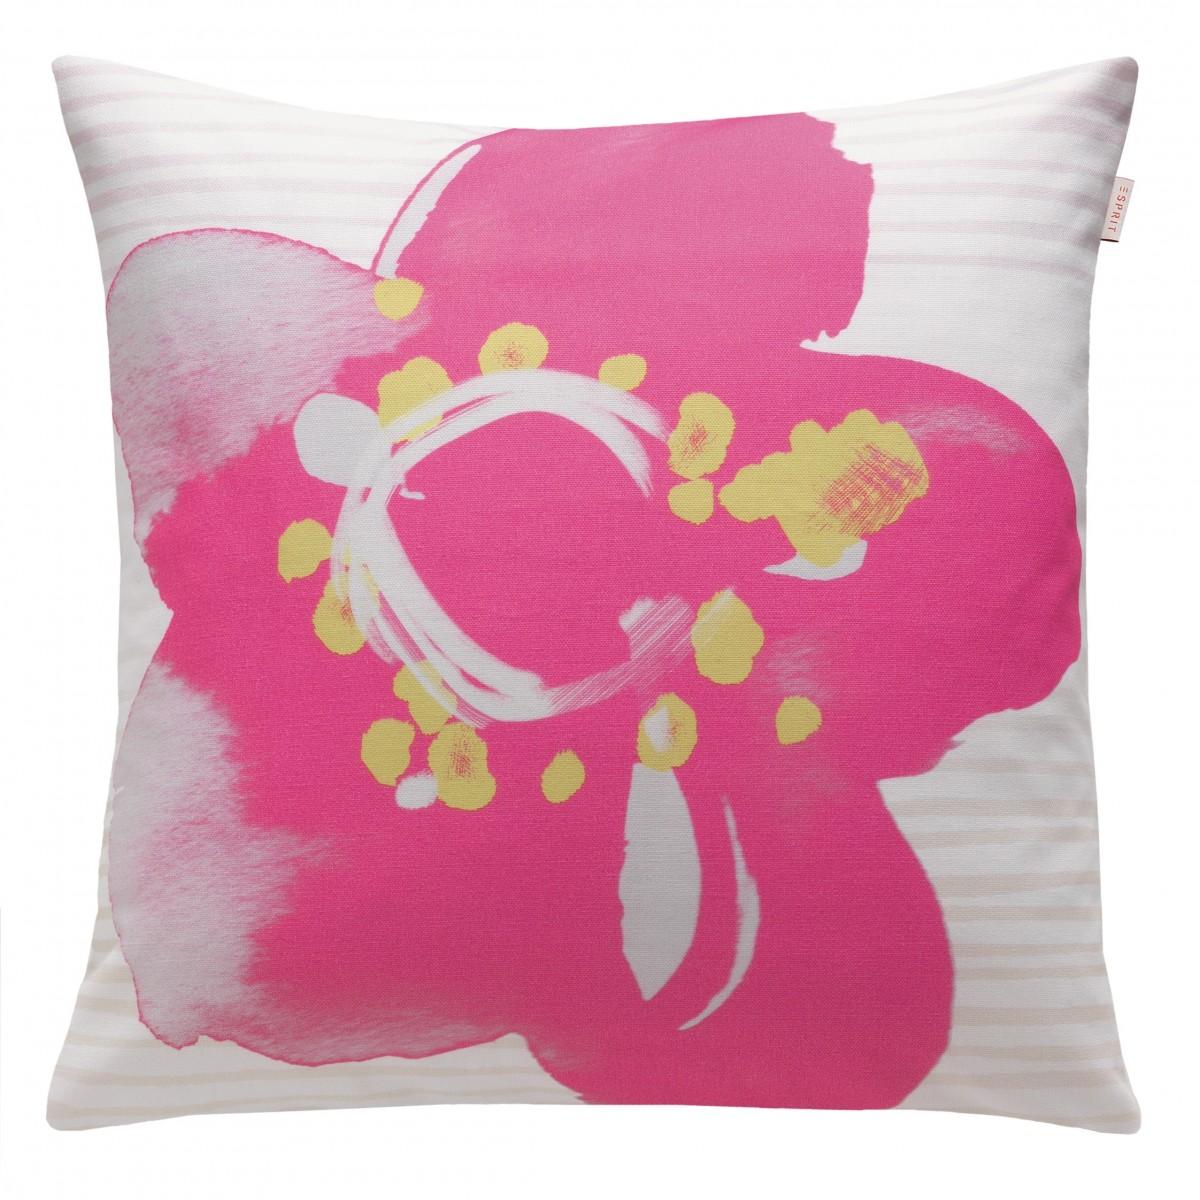 esprit kissenh lle bella pink 50x50cm wohntextilien kissen flowers. Black Bedroom Furniture Sets. Home Design Ideas